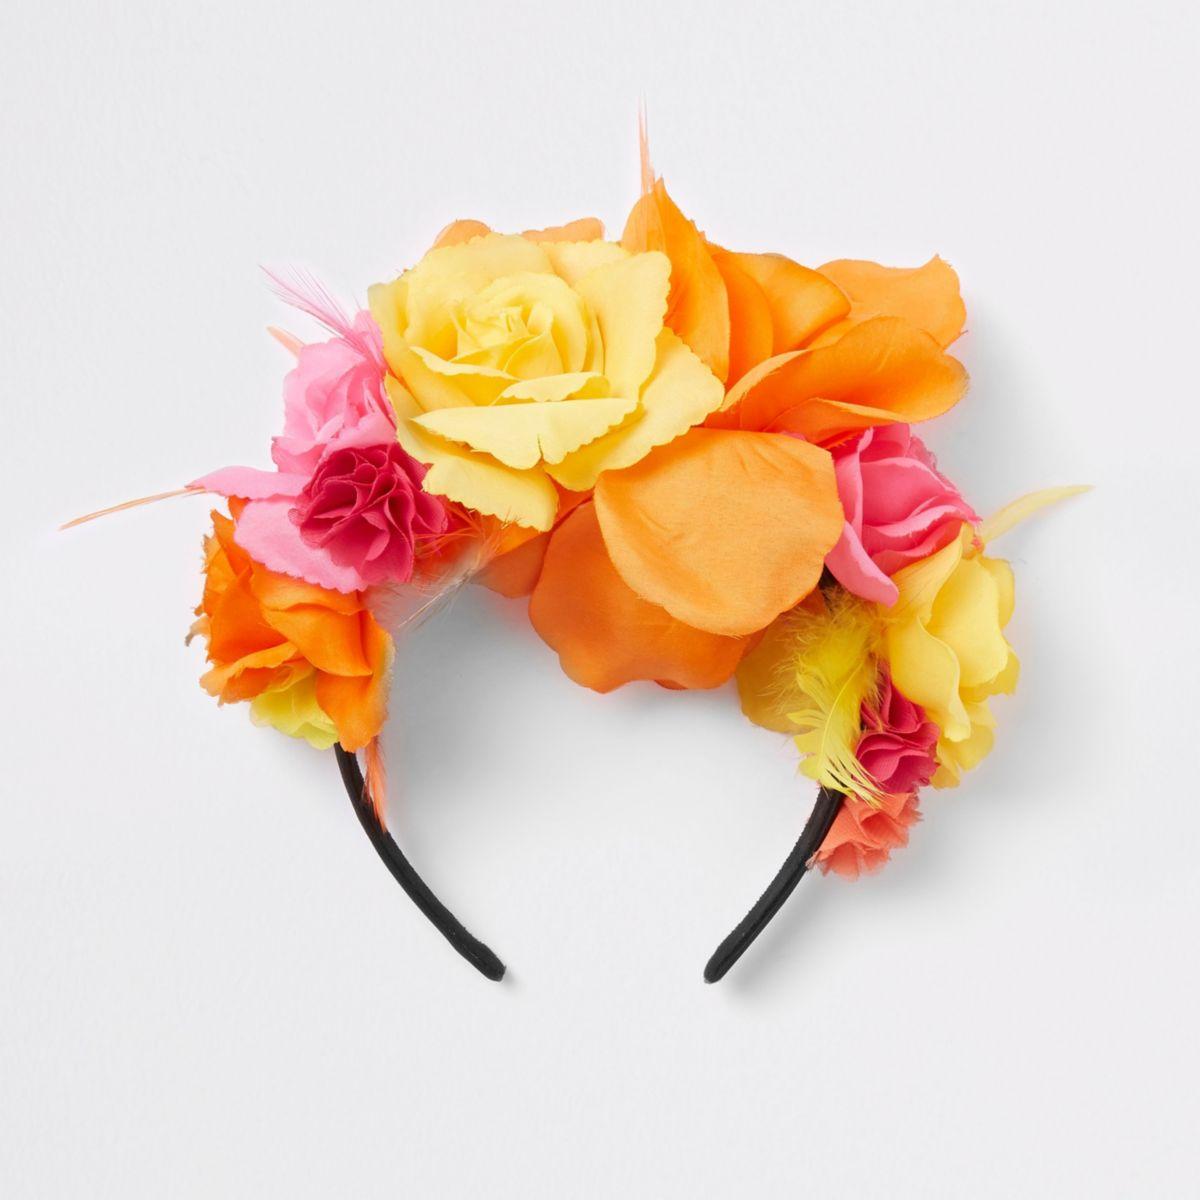 RI Studio – Pinkes, geblümtes Stirnband